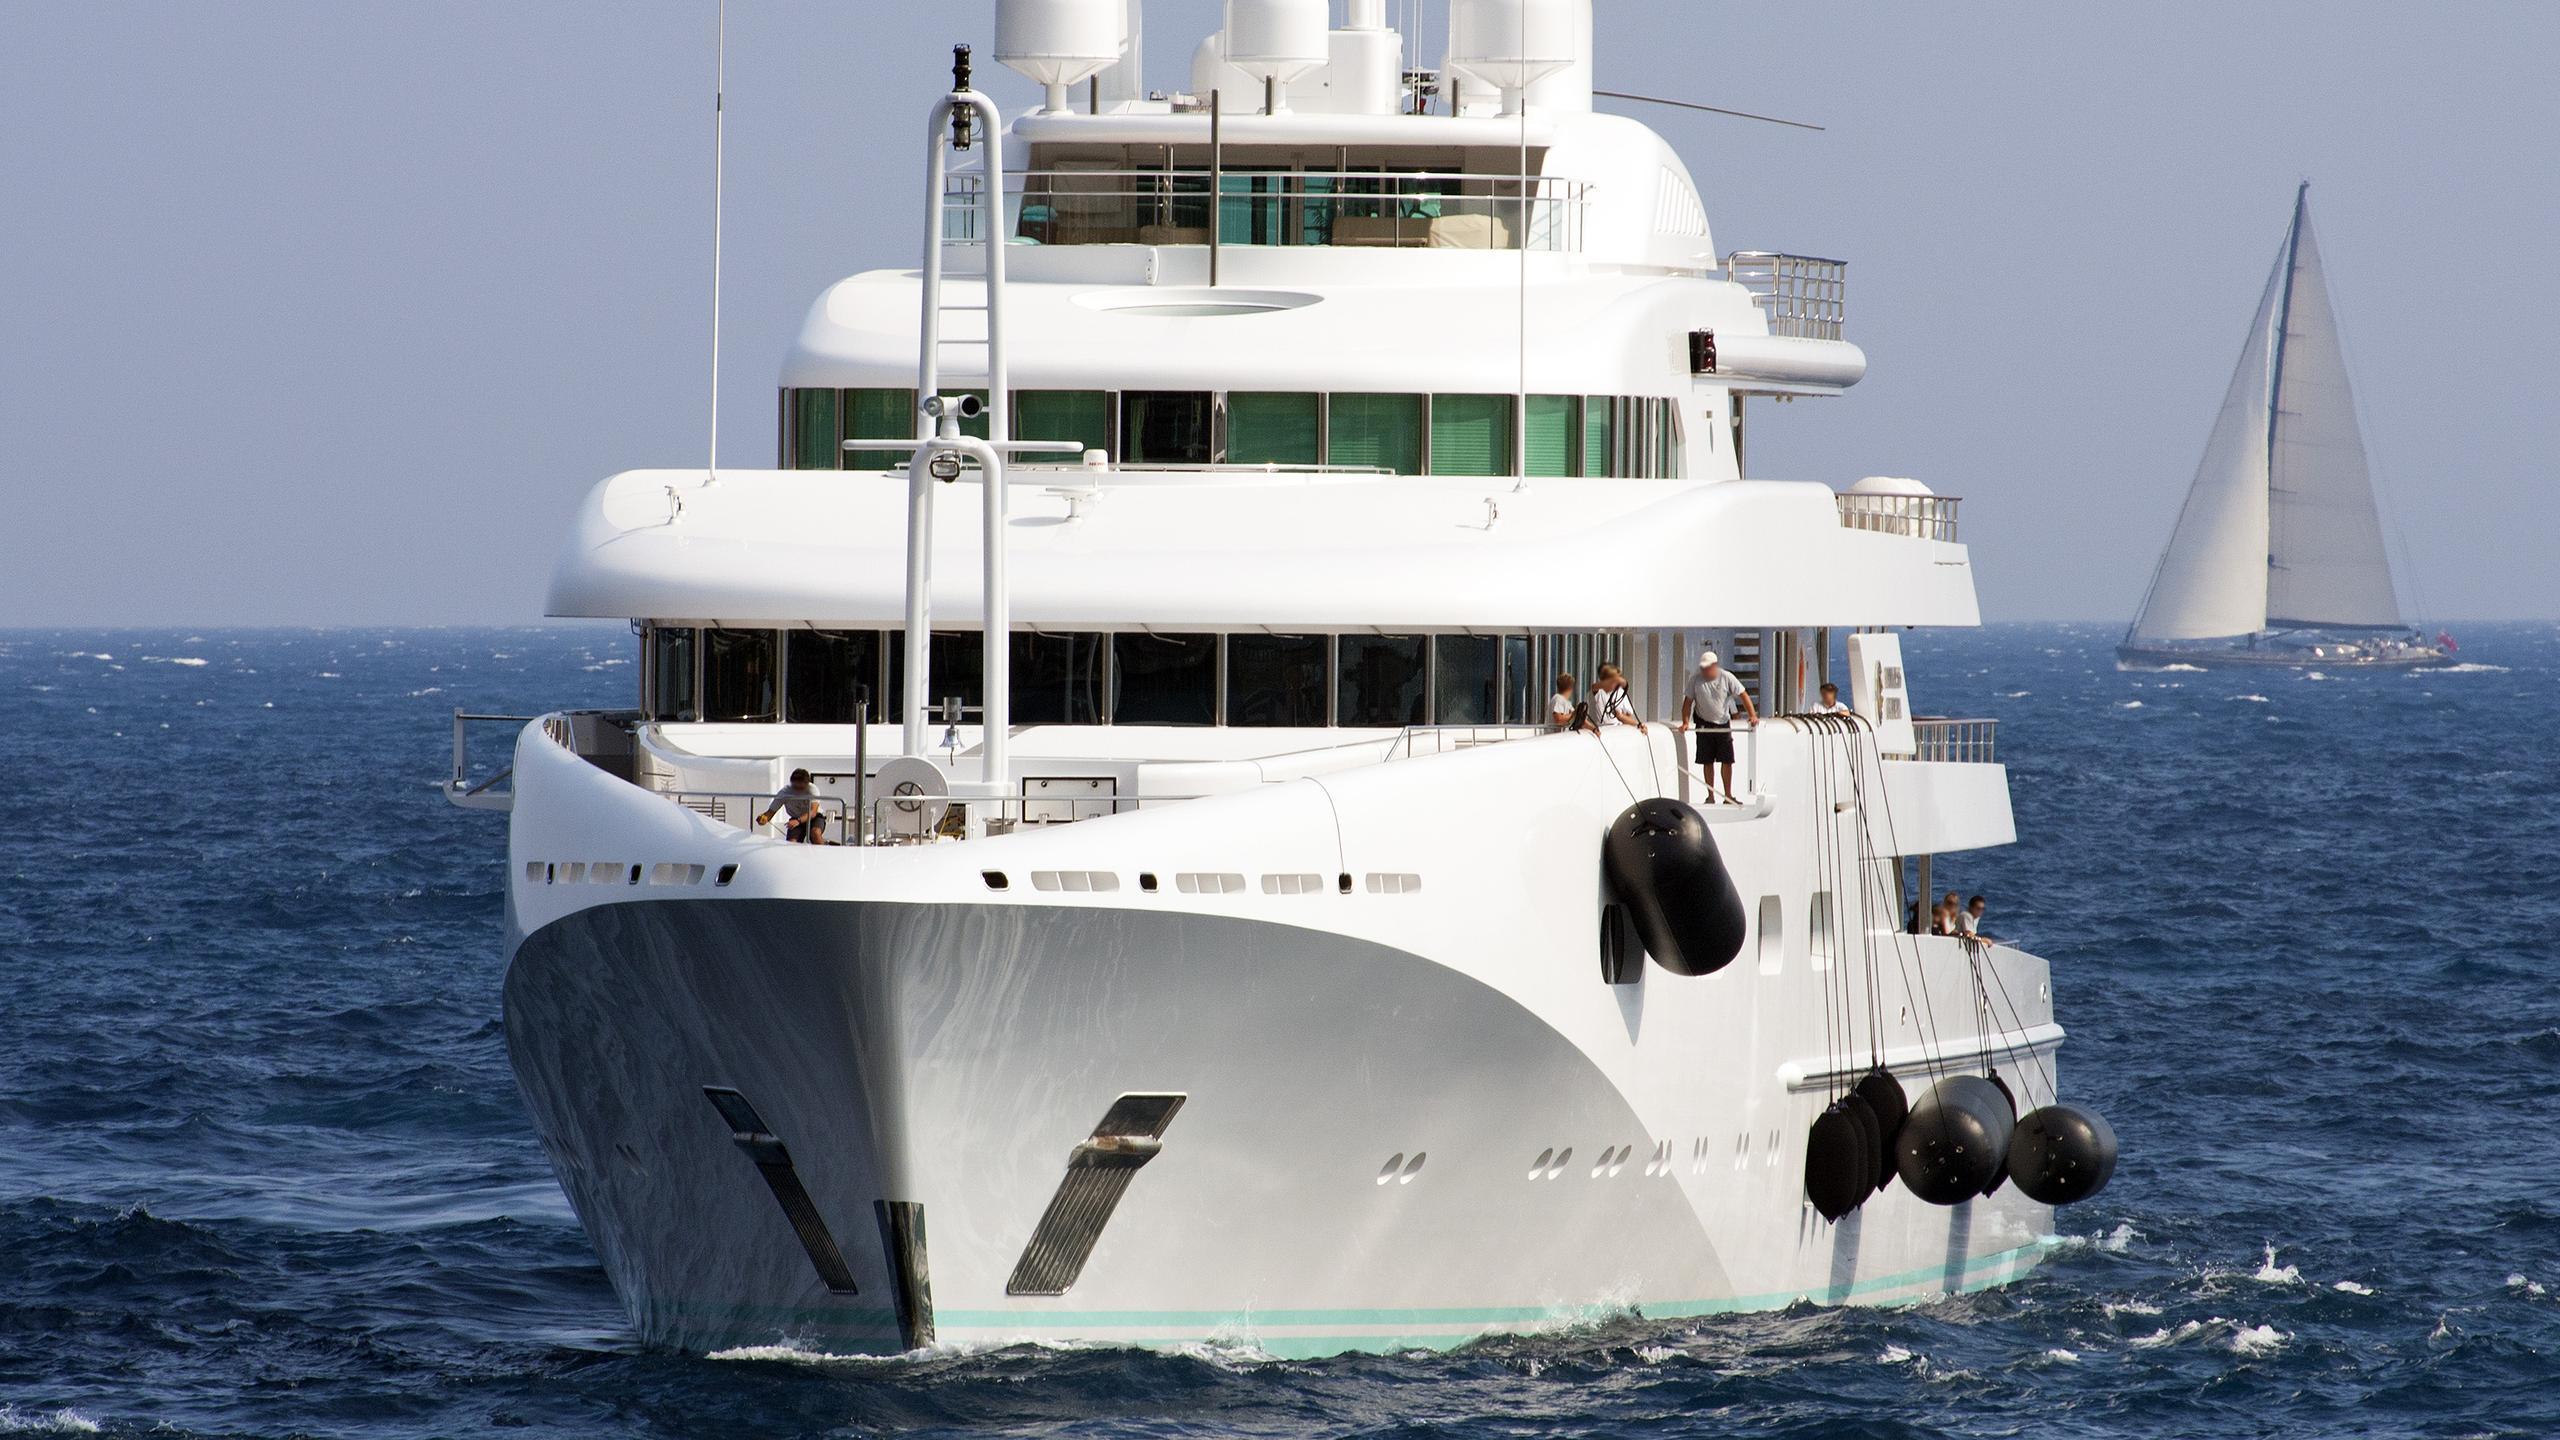 pegasus-viii-motor-yacht-royal-denship-2003-79m-bow